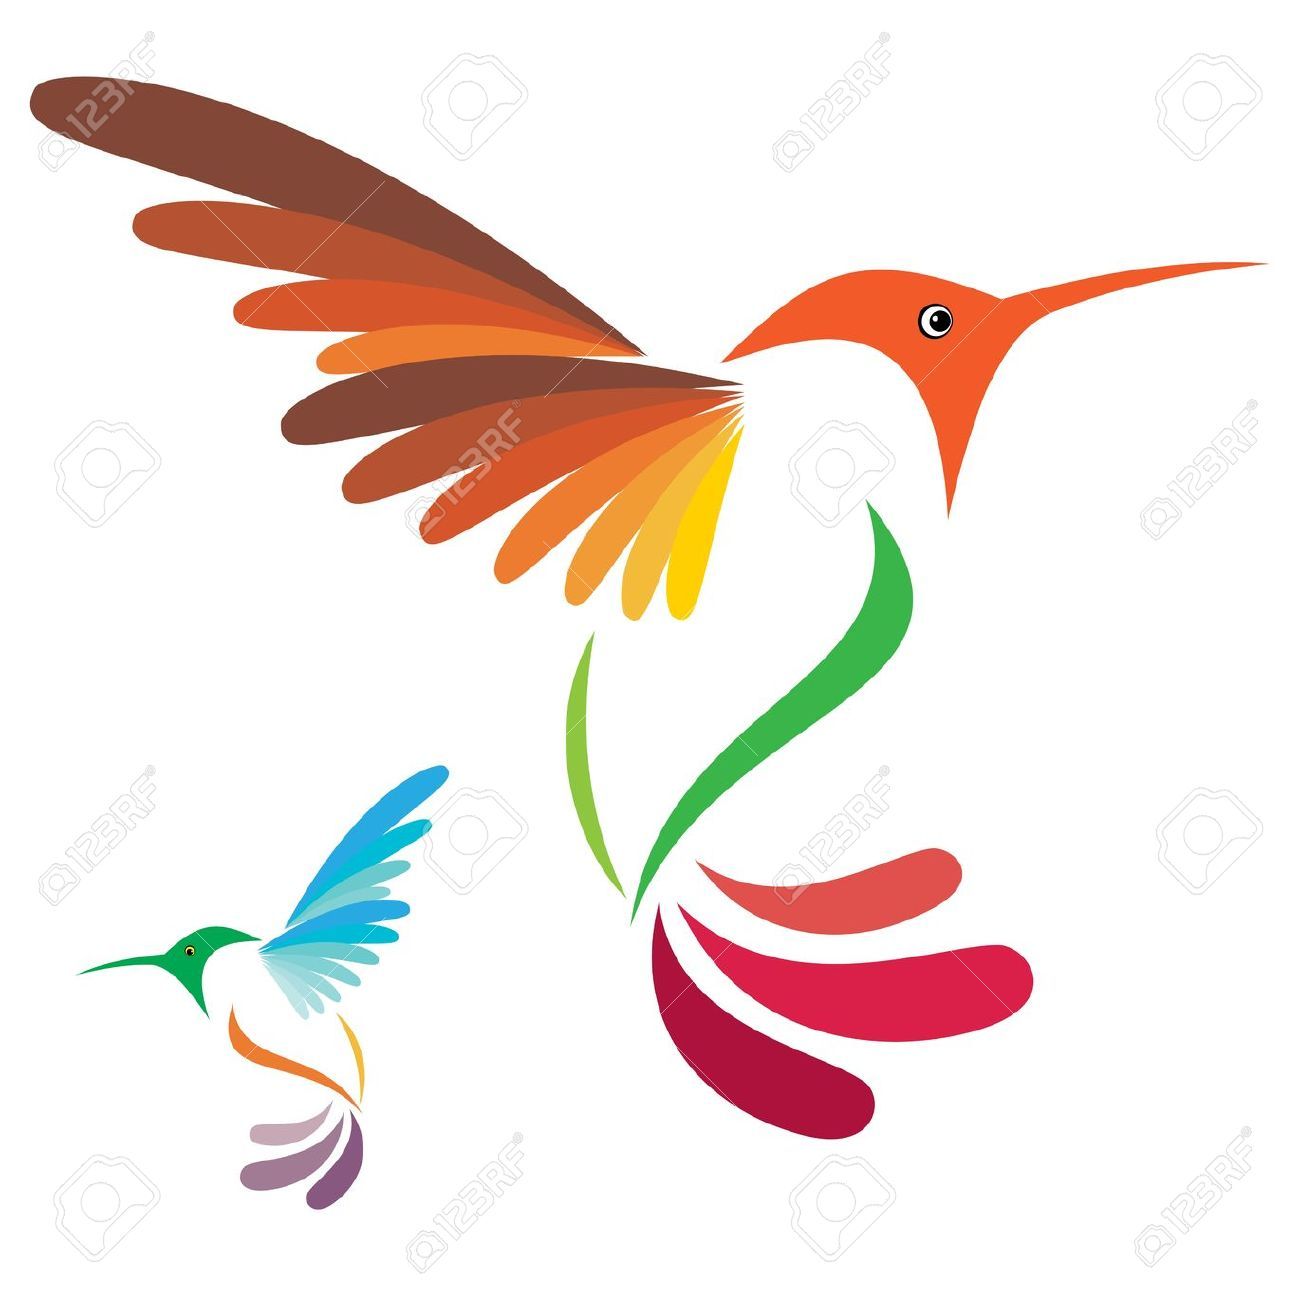 Hummingbird silhouette clipart.